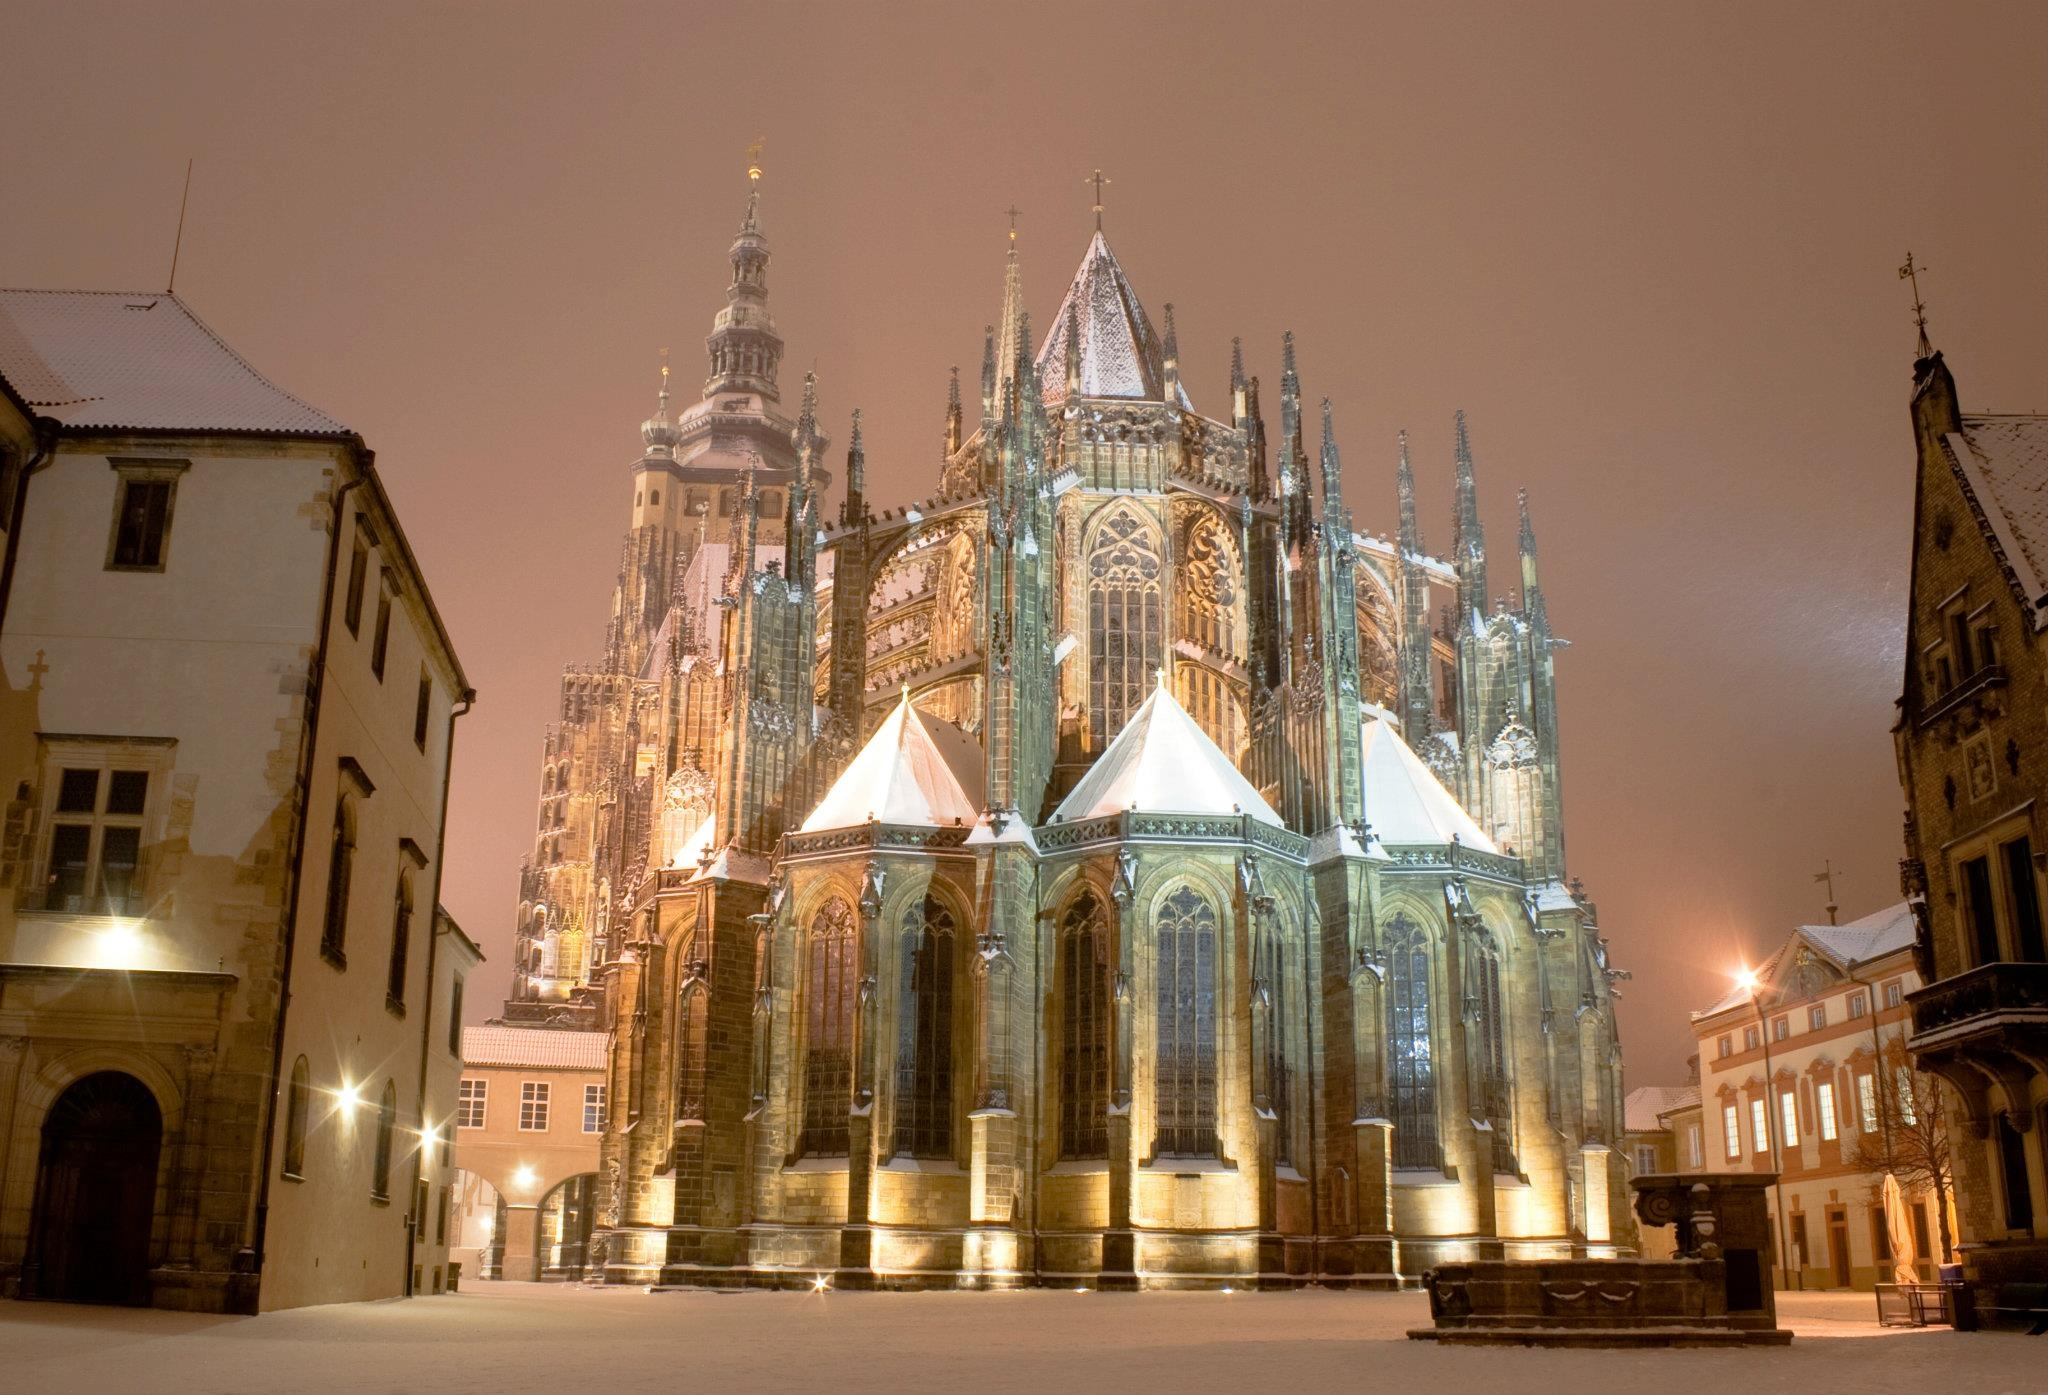 Chrám svatého Víta, Václava a Vojtěcha - Foto: Marek Nahodil